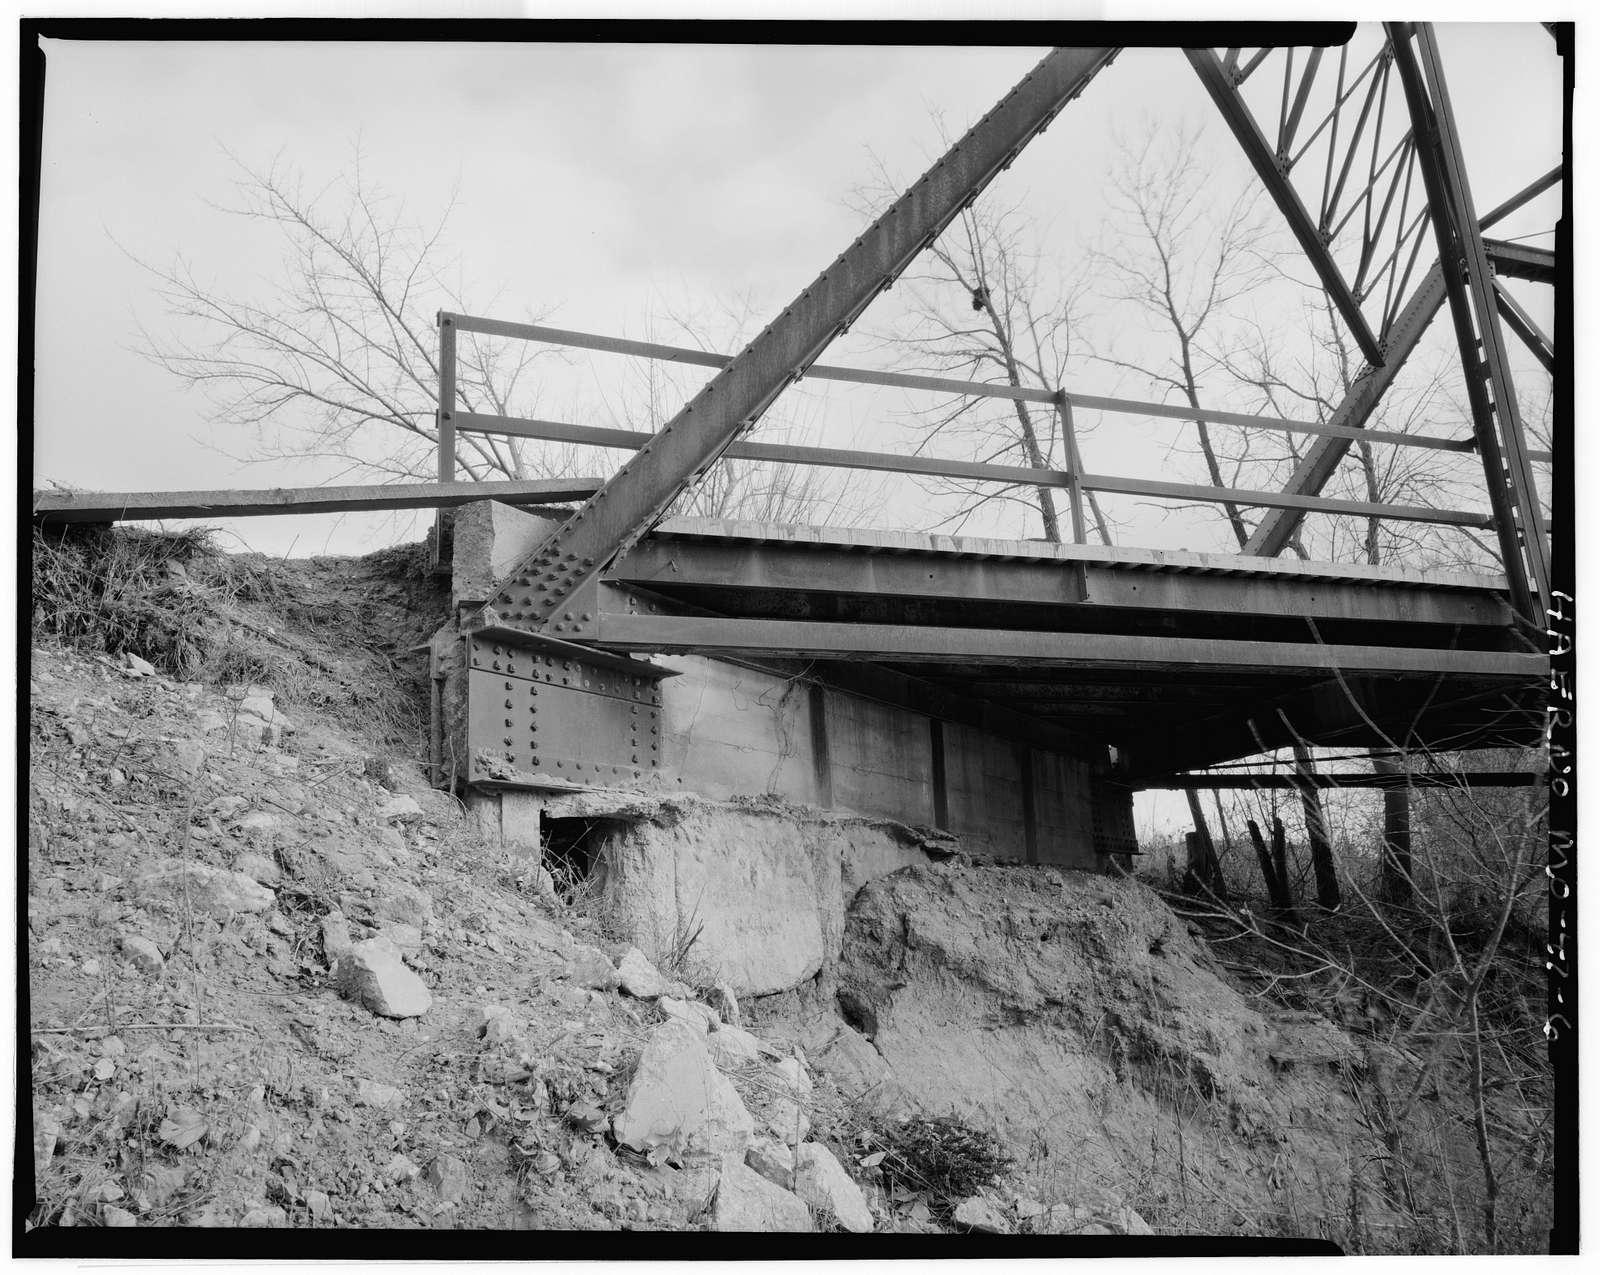 Old Grade Road Bridge, Spanning Brashear Drainage Ditch (Salt River), Brashear, Adair County, MO